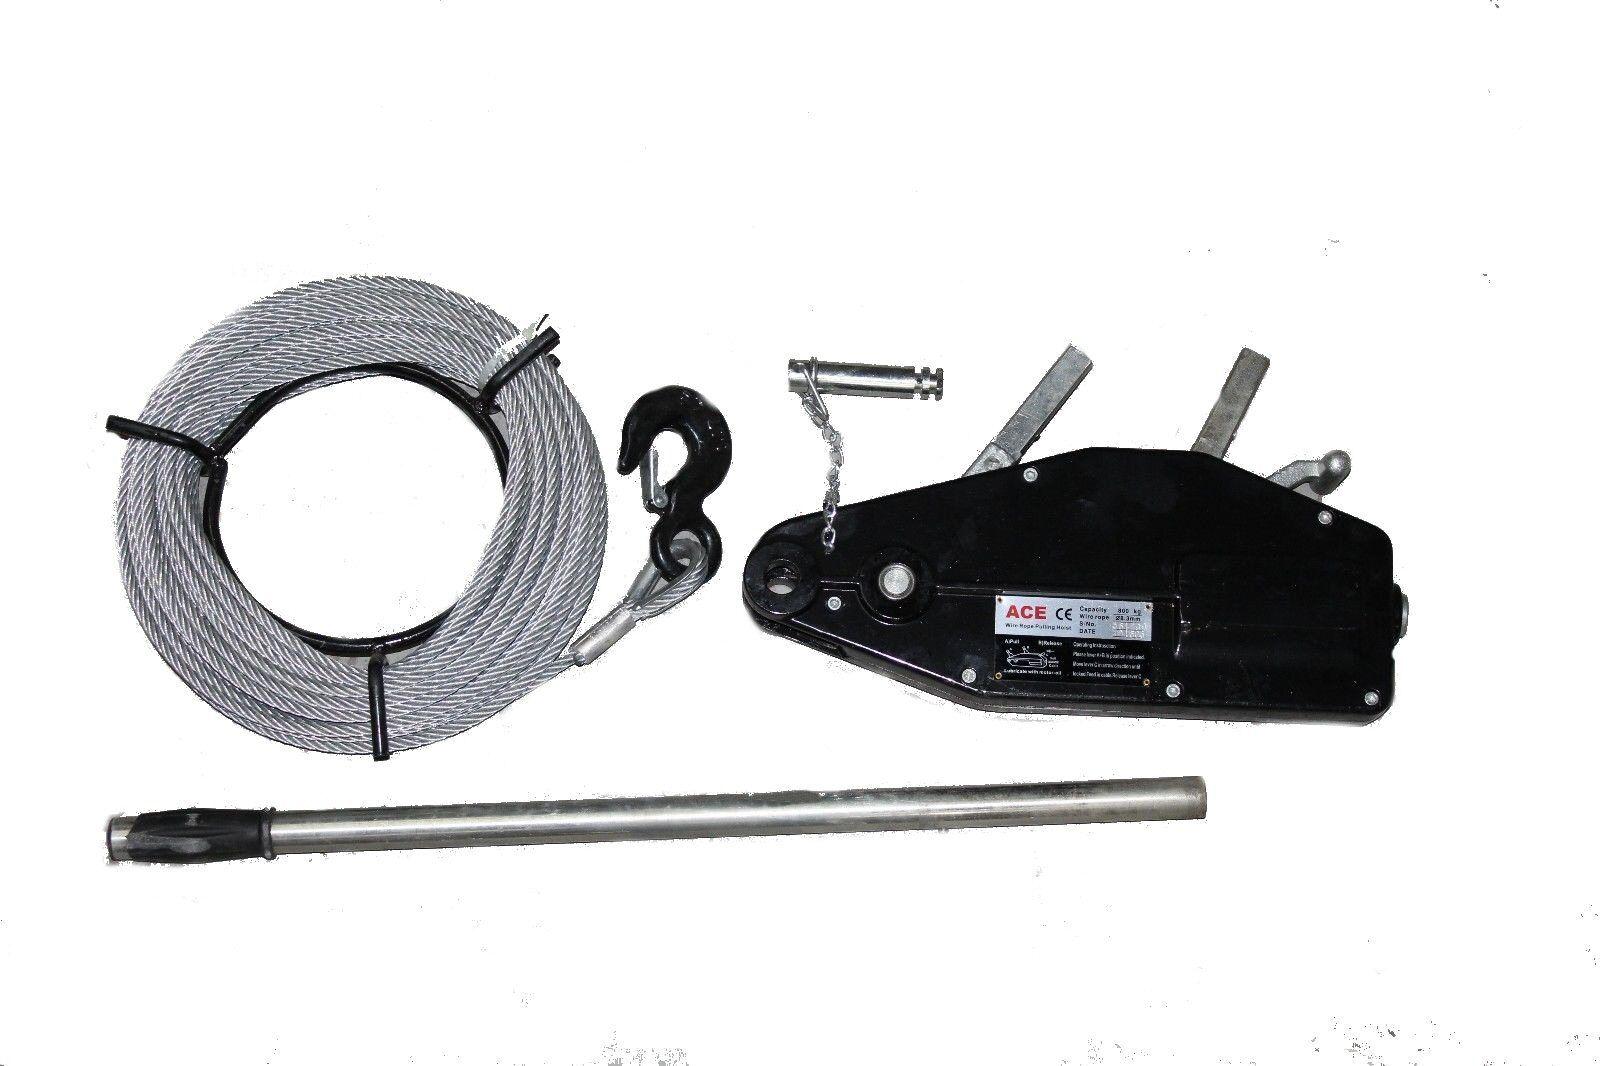 3200kg Wire Rope Pulling Hoist/ Winch c/w 20M Wire Rope 700064751442 ...